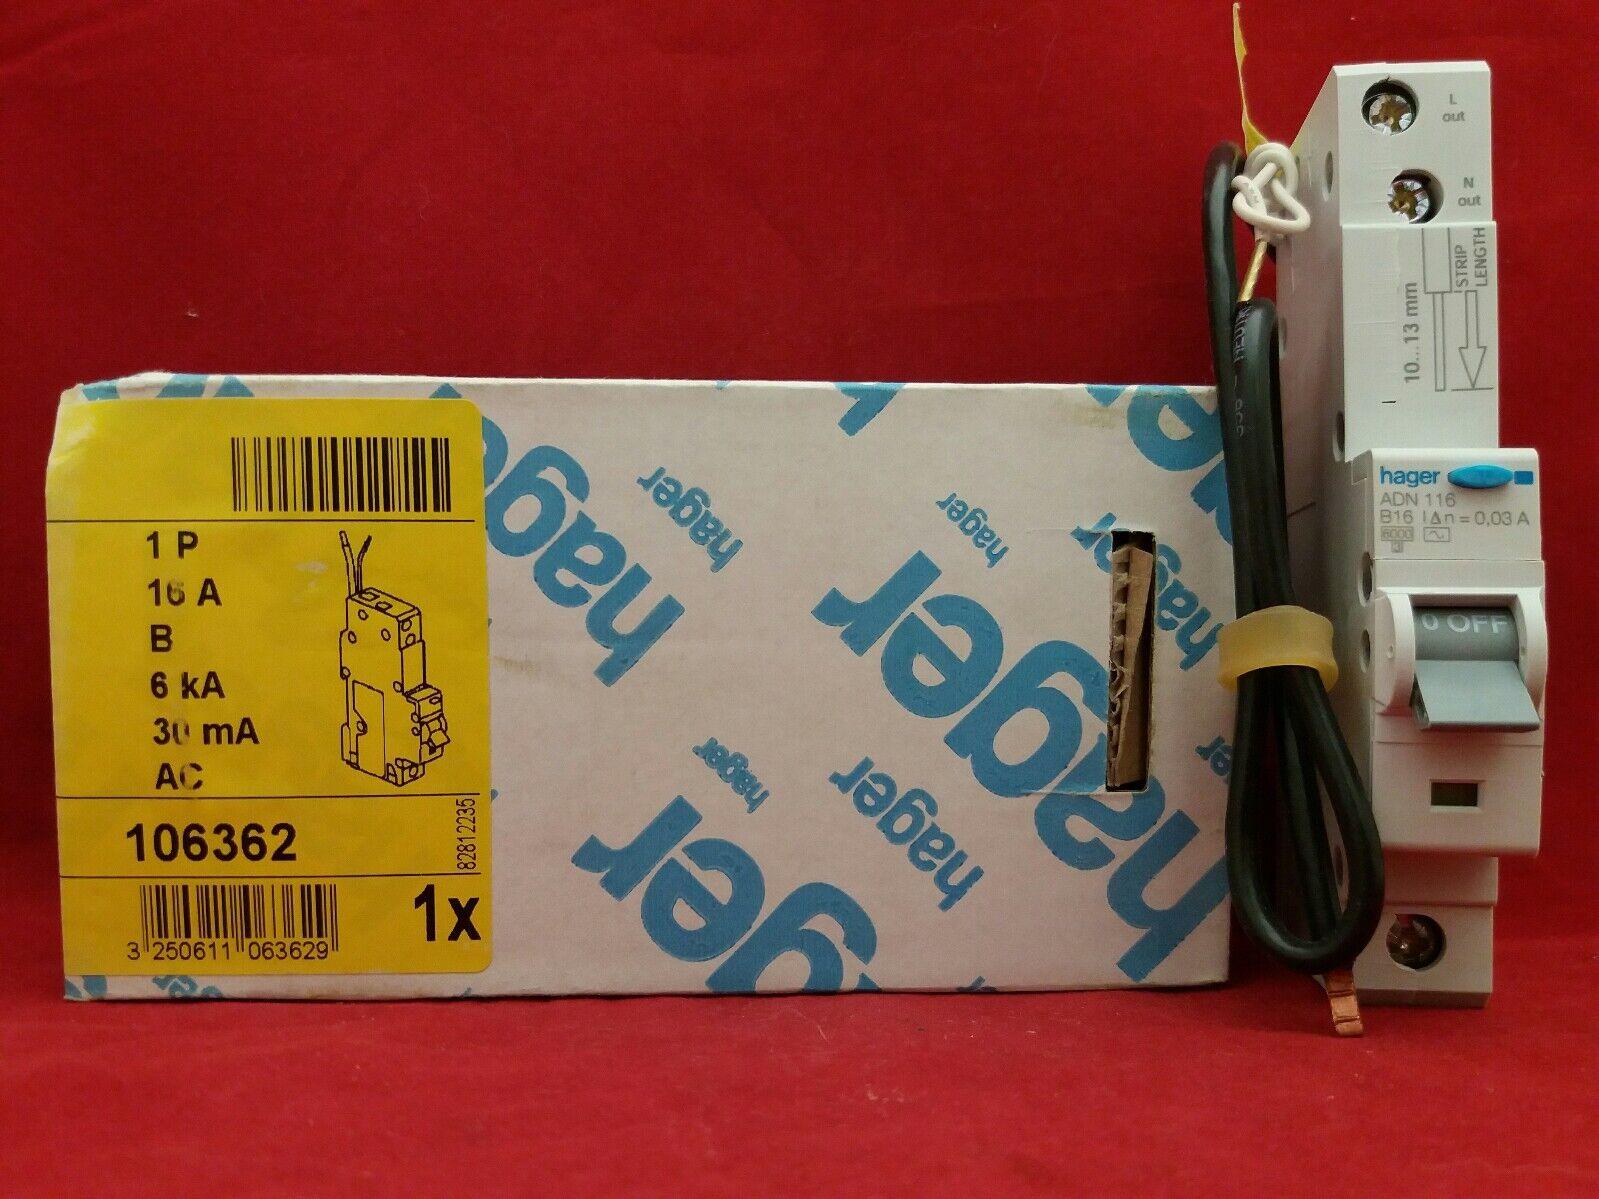 Hager 16 amp 16a RCBO ADN116 30ma MCB//RCD B Type 6kA 106362 New